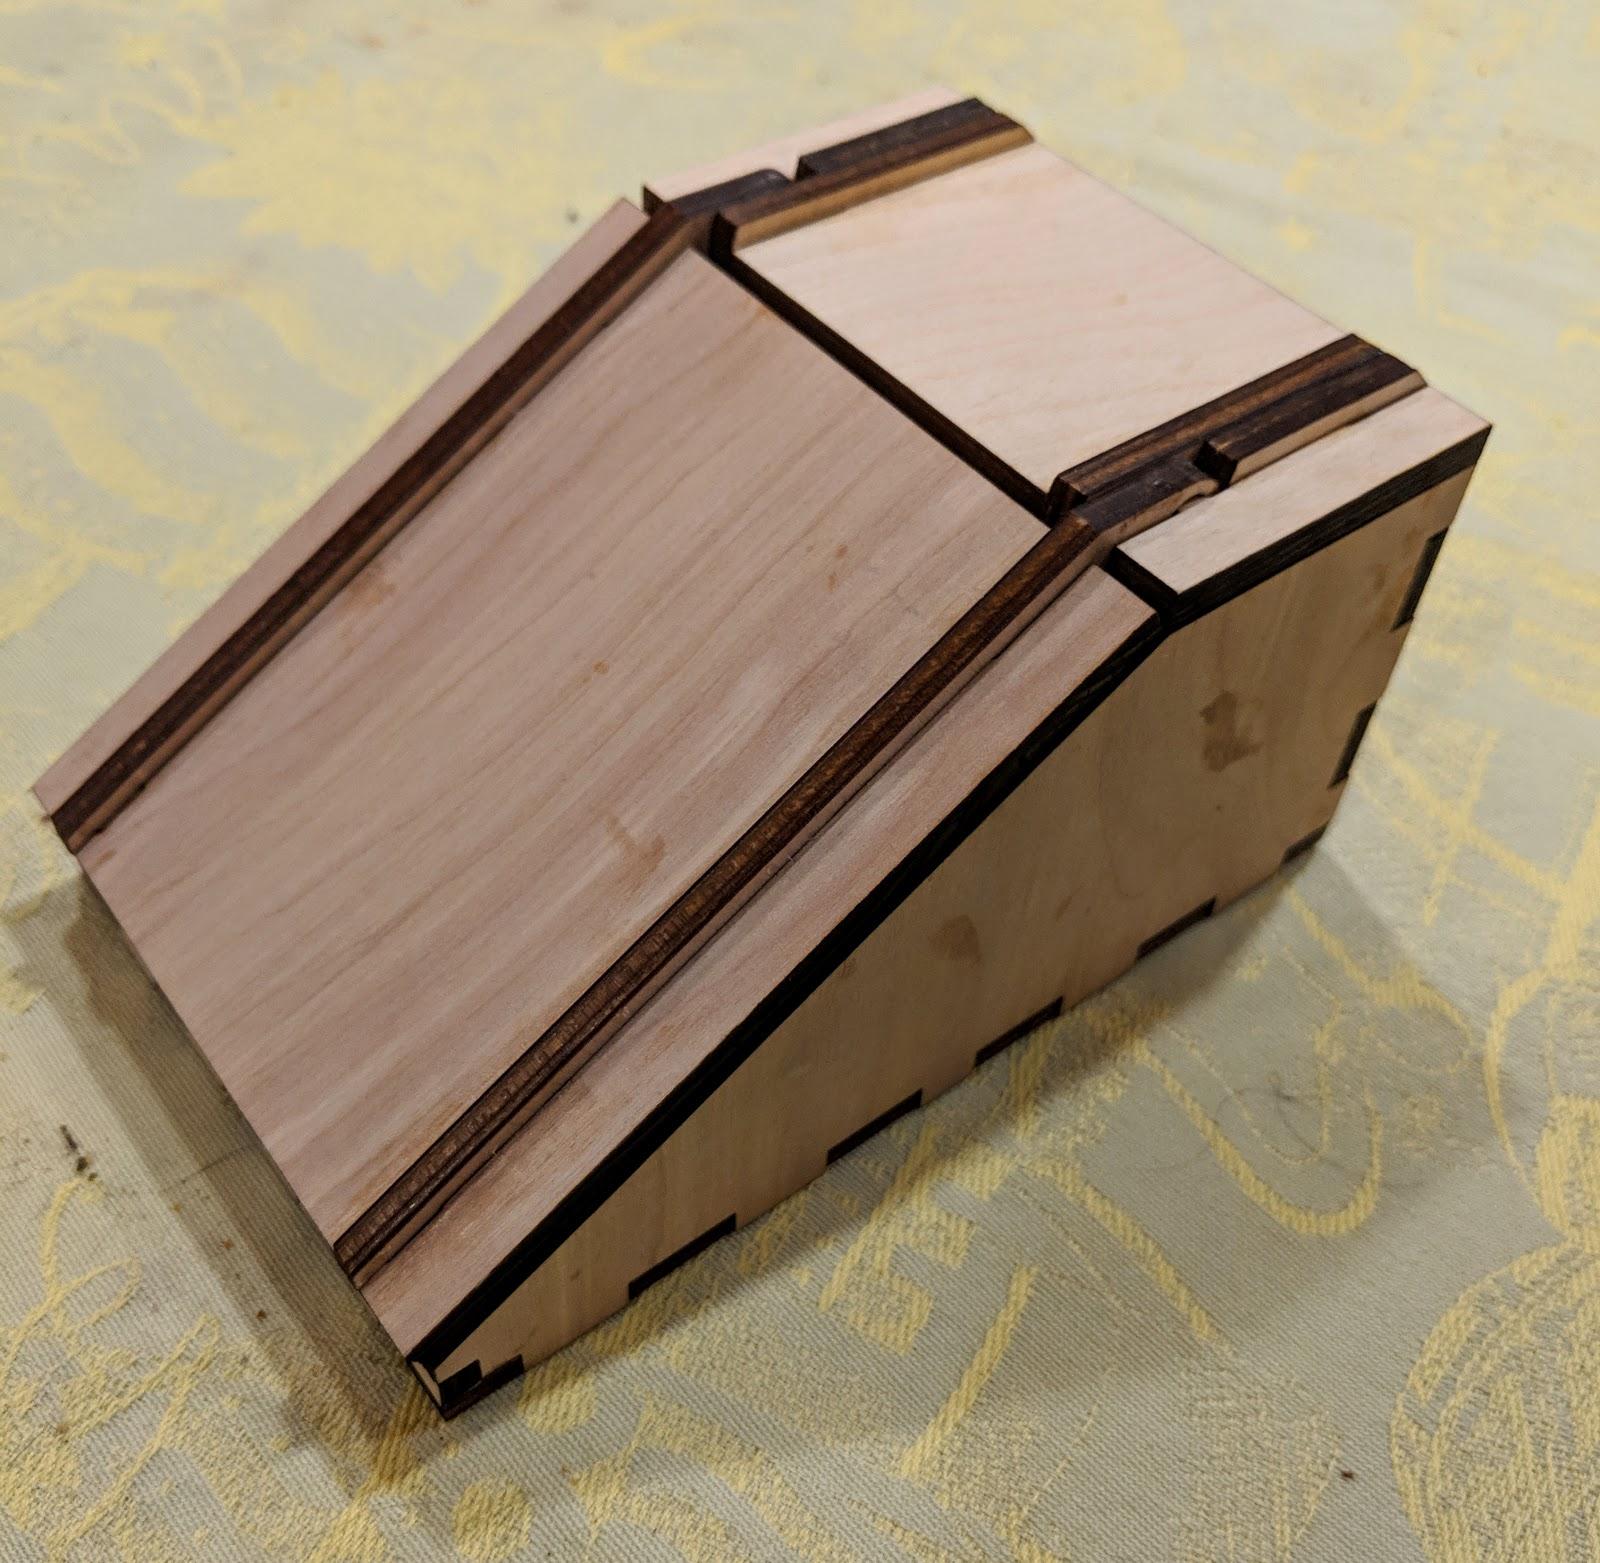 Microcarpentry